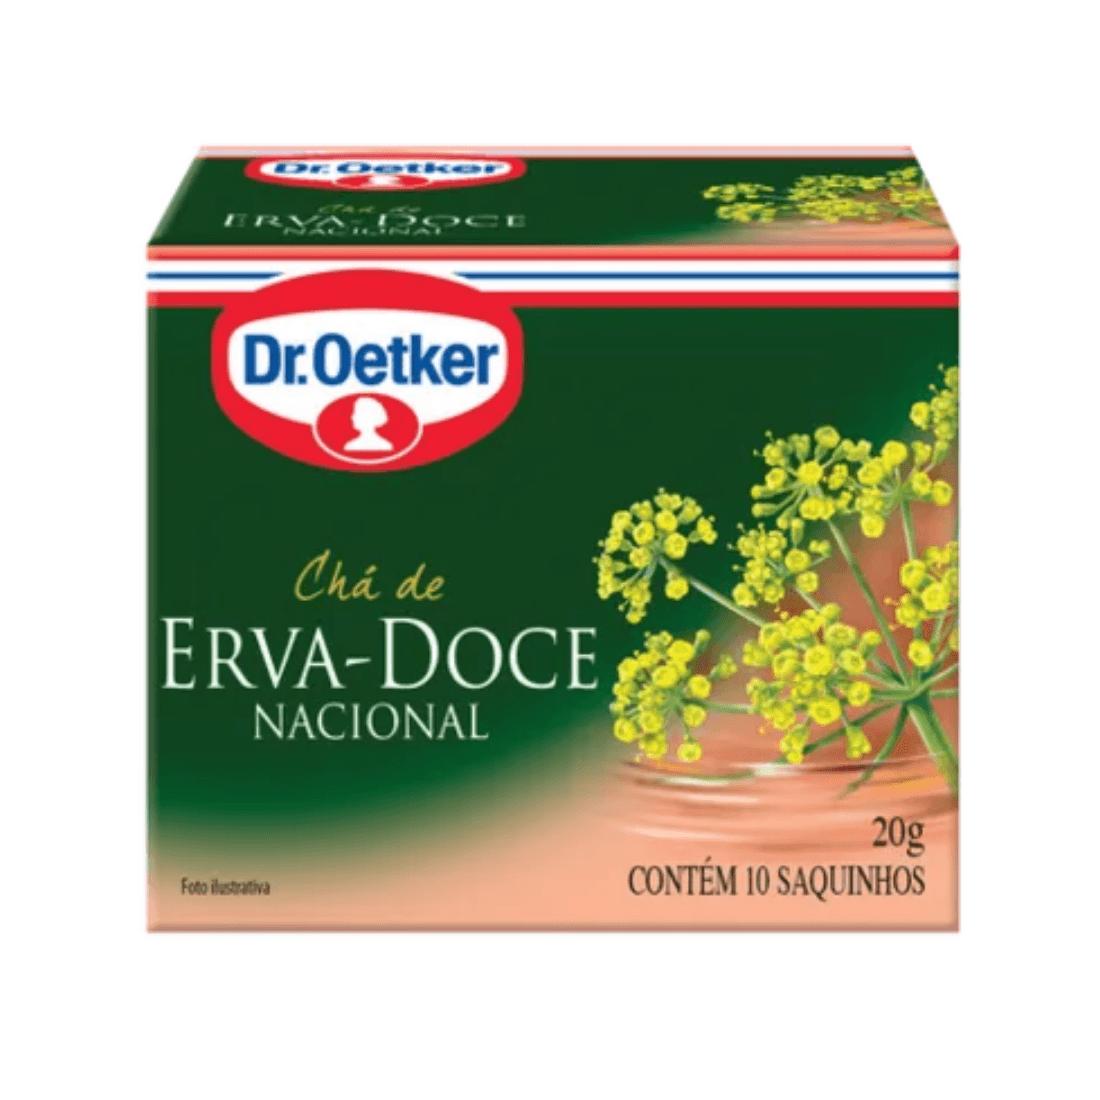 CHÁ ERVA DOCE DR OETKER SACHÊ 30G CAIXA 15 UNIDADES